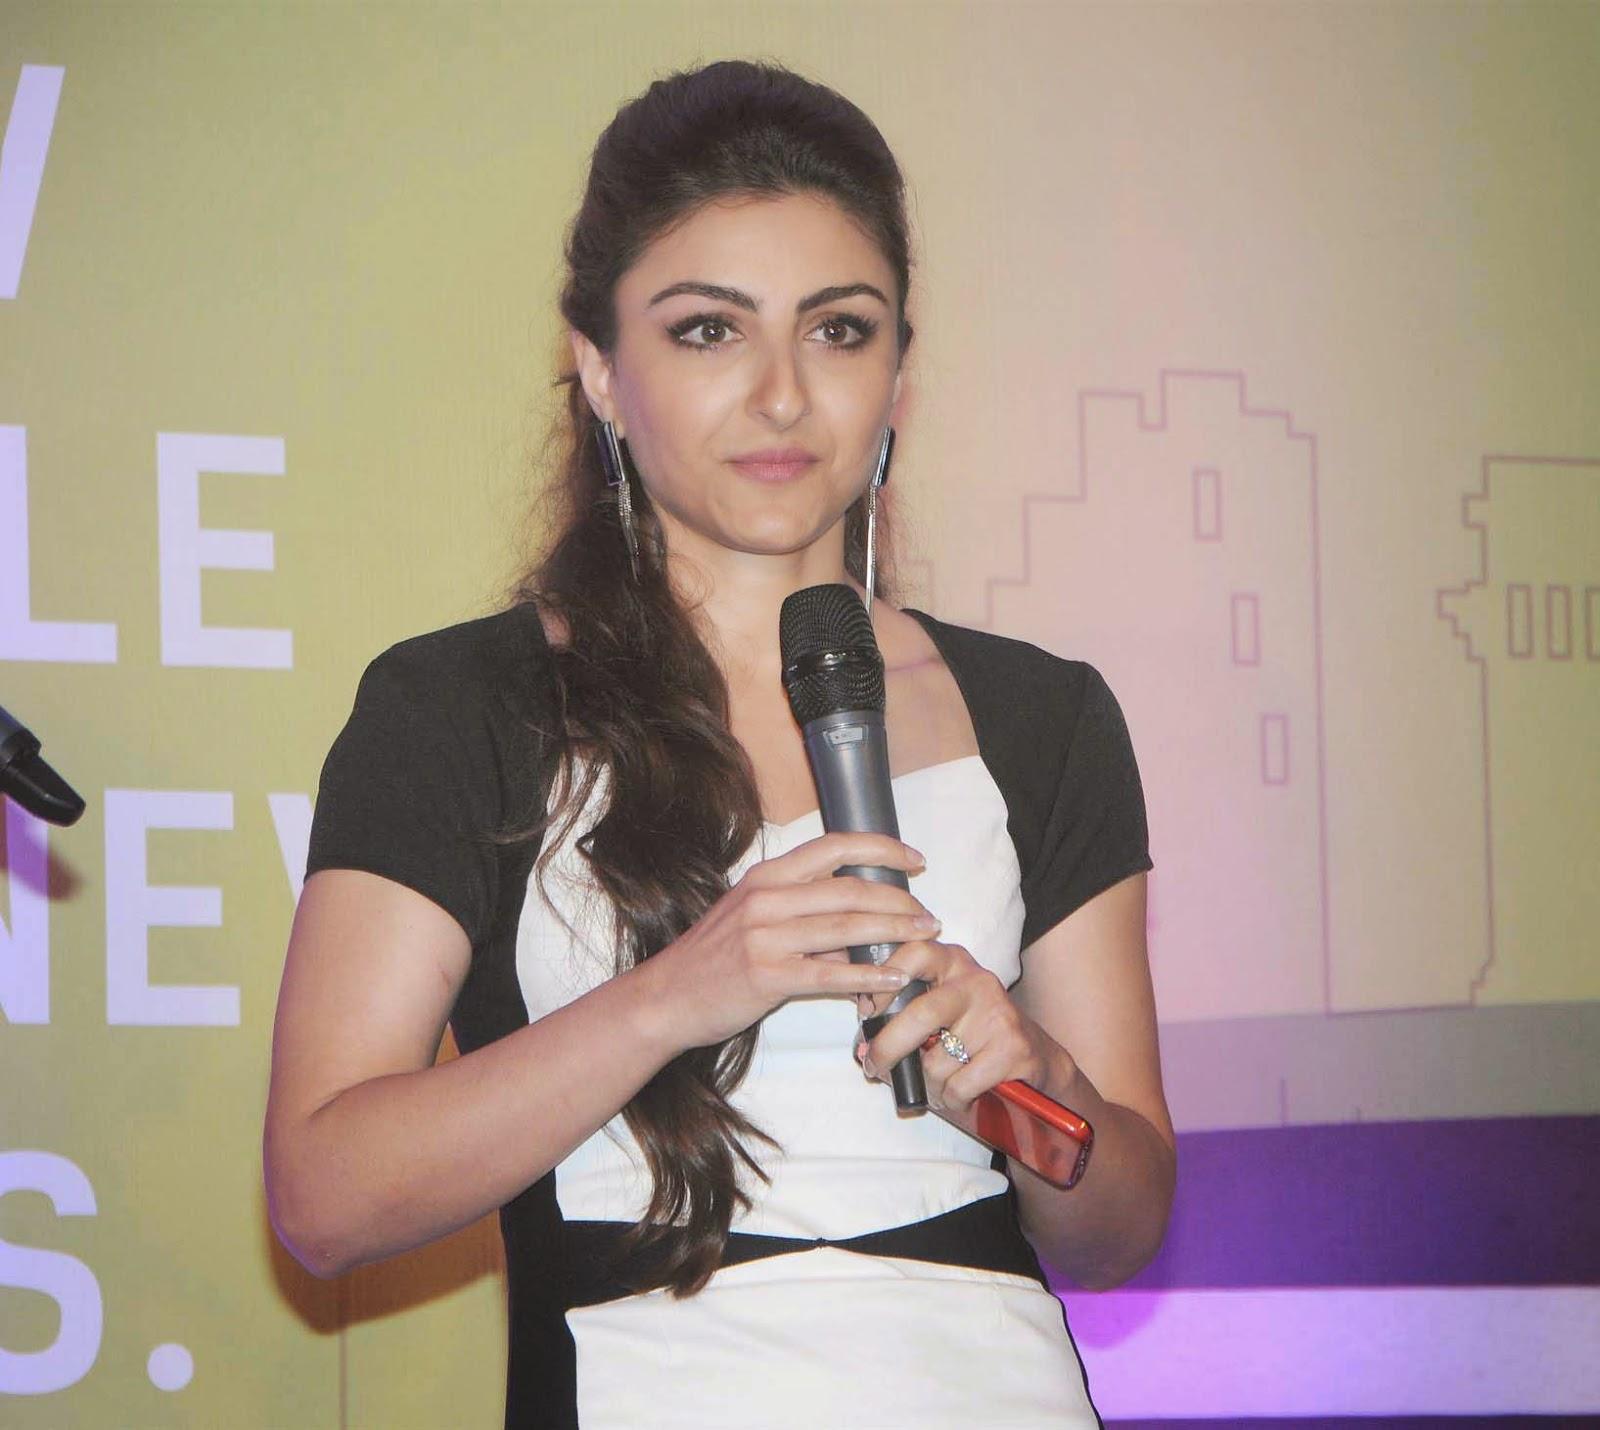 Soha Ali Khan Launch Event Of Ola Cabs Smart App